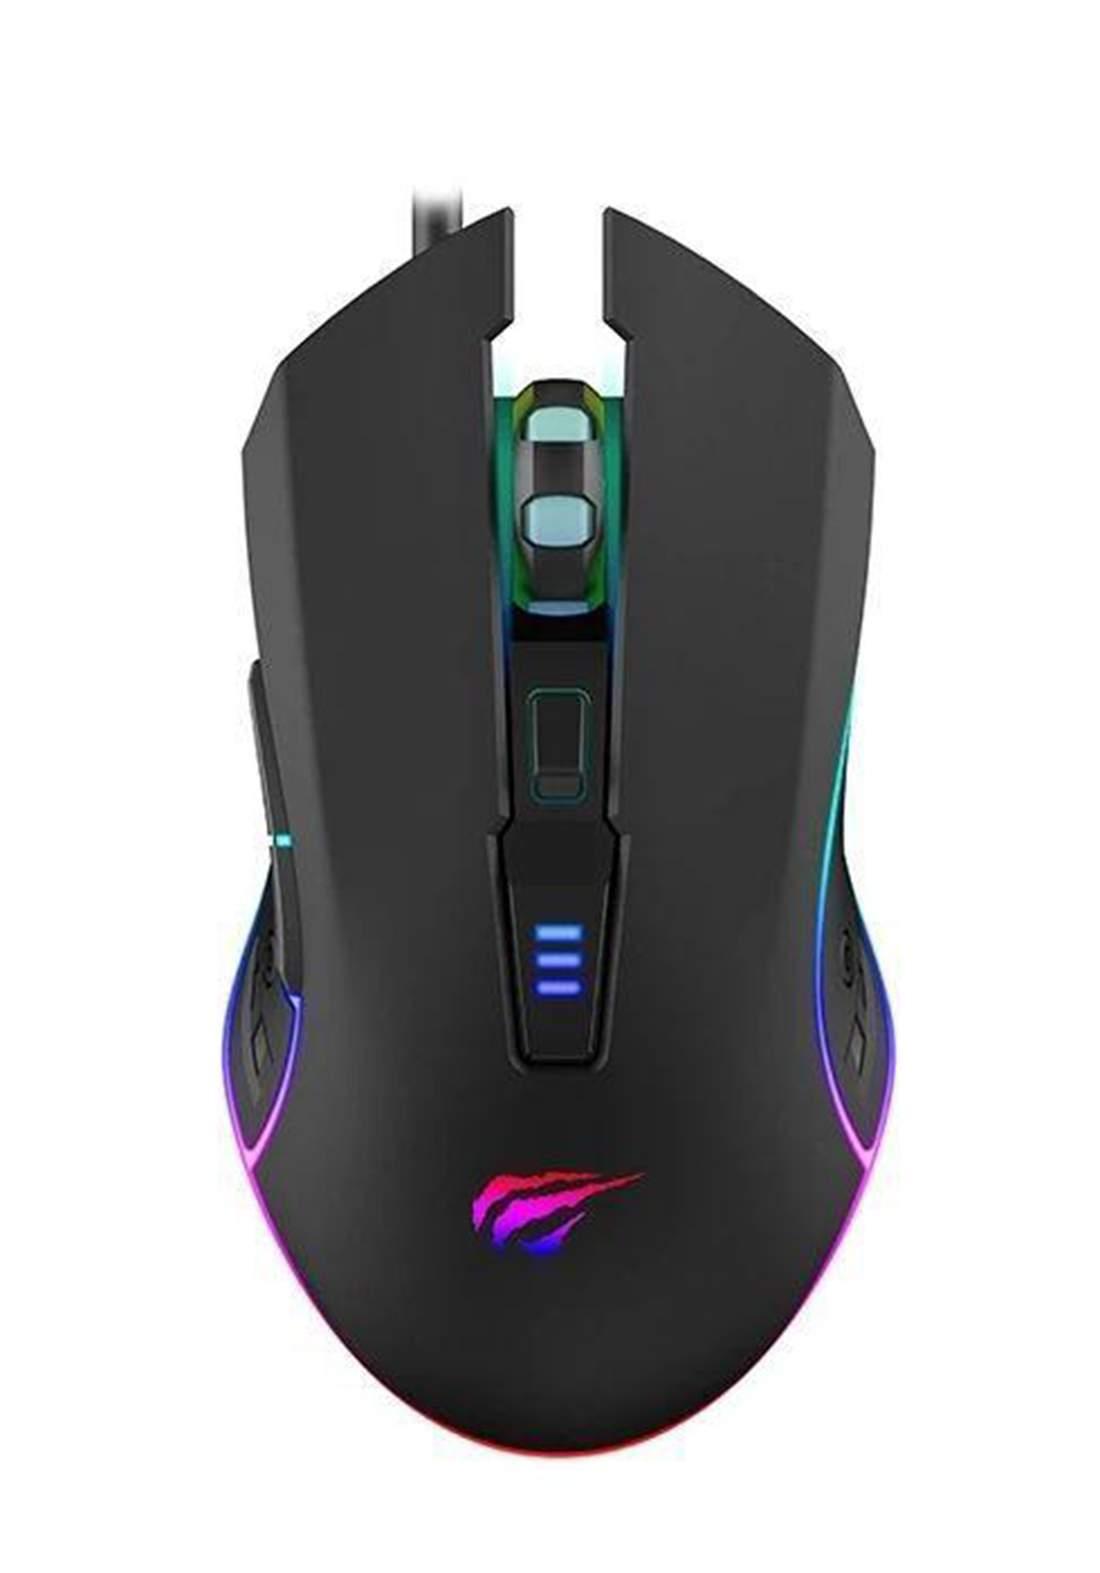 Havit HV-MS1018 RGB Optical Gaming Mouse - Black  ماوس